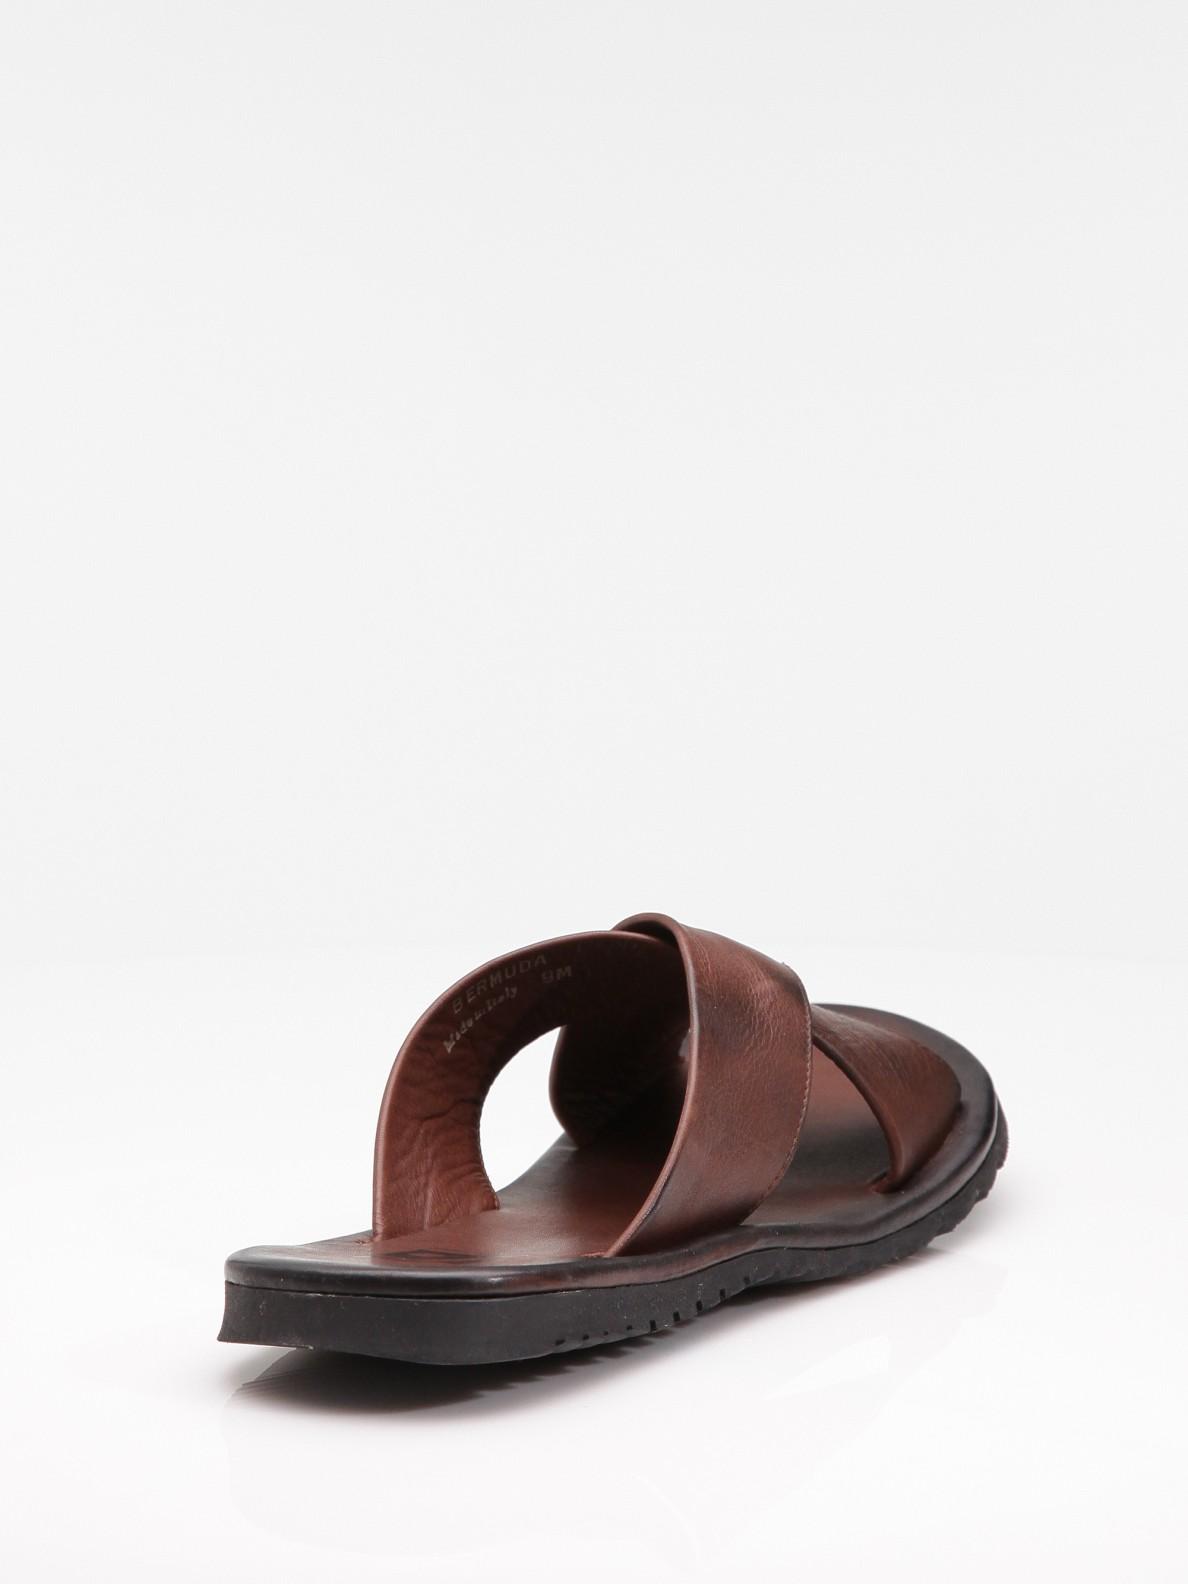 Saks Fifth Avenue Criss Cross Sandals In Brown For Men Lyst